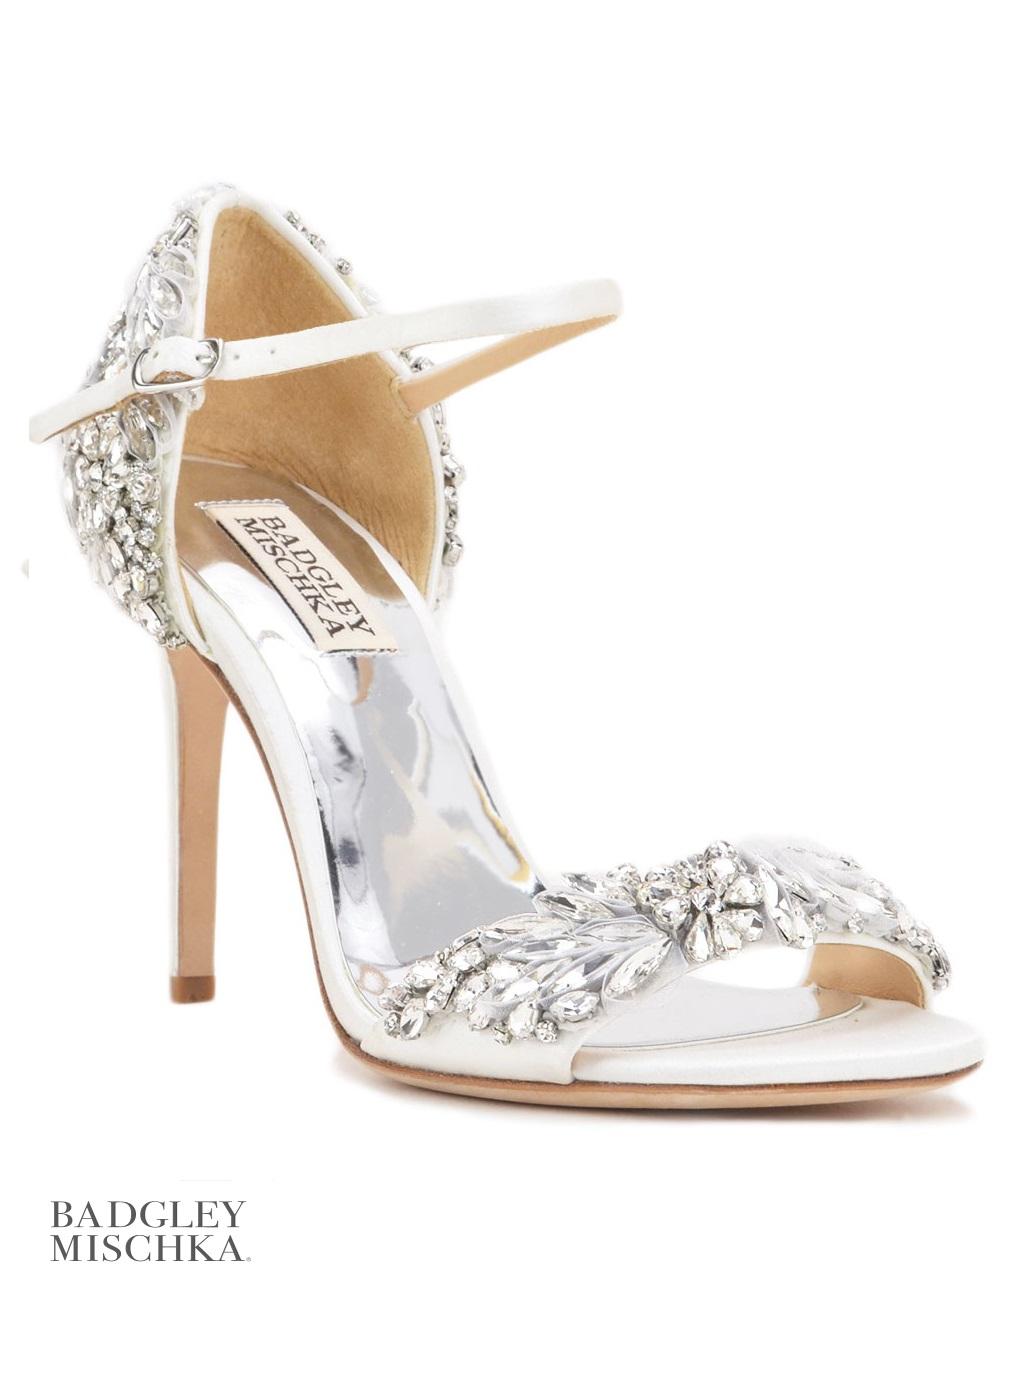 Badgley Mischka2 - Sapatos de princesa